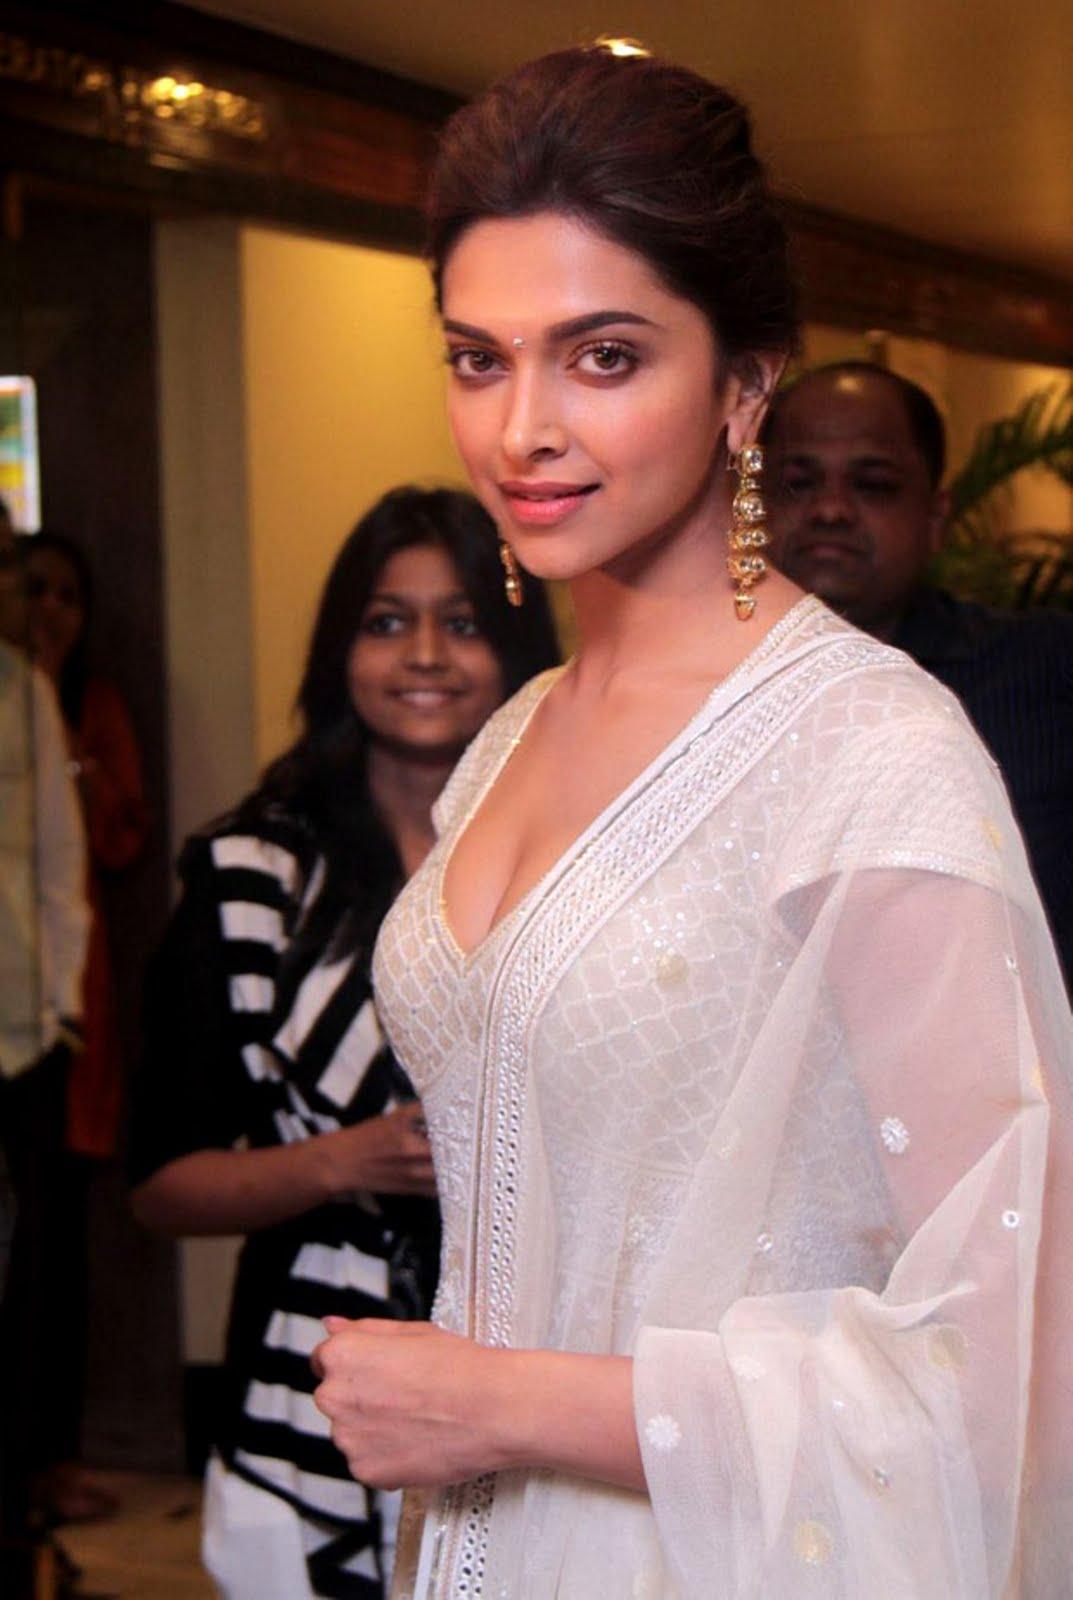 Deepika Padukone in White Designer Long Dress at an Event ...